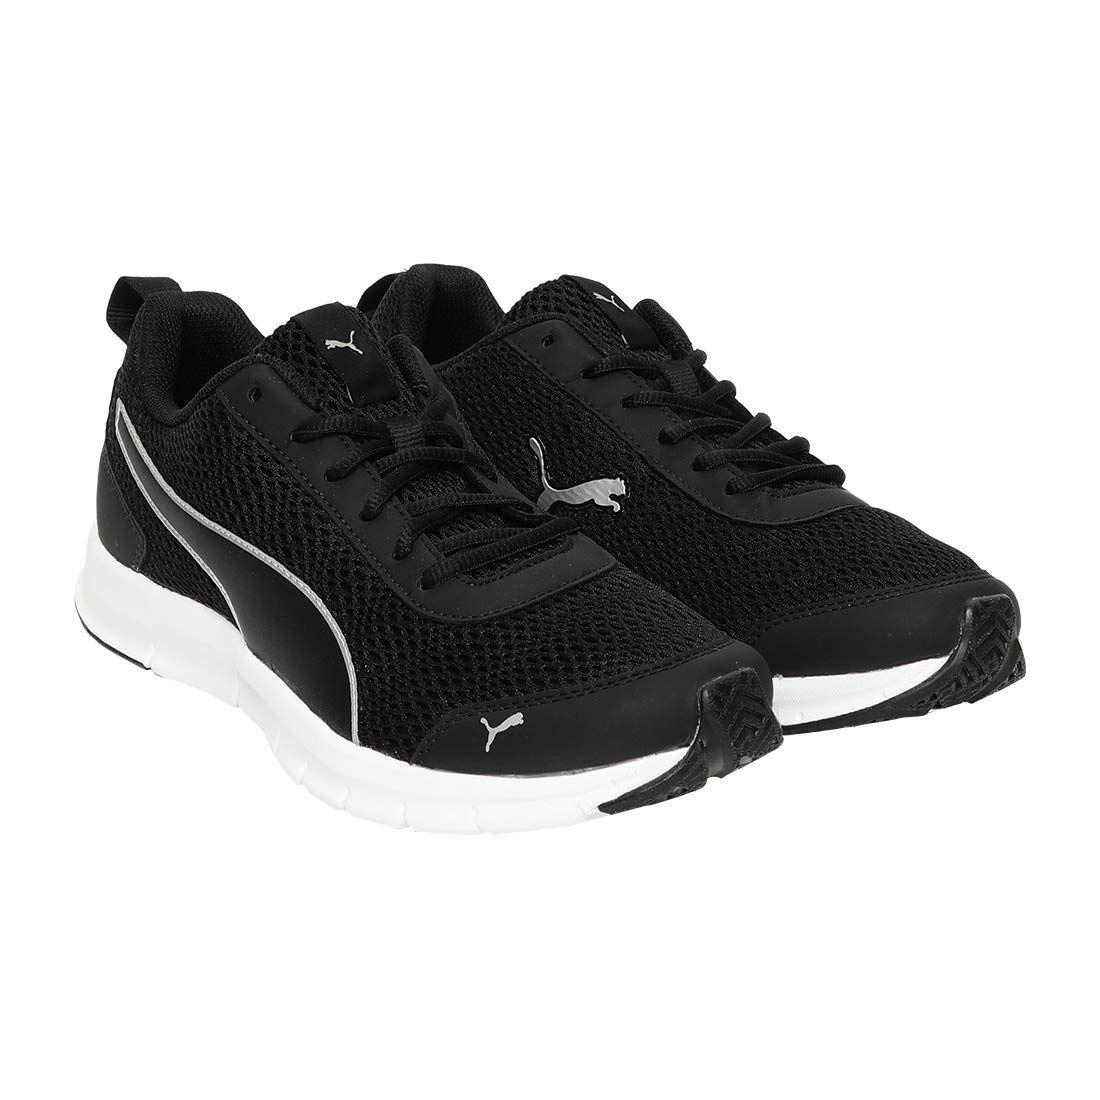 Puma Sports Shoes – Amazon | Puma